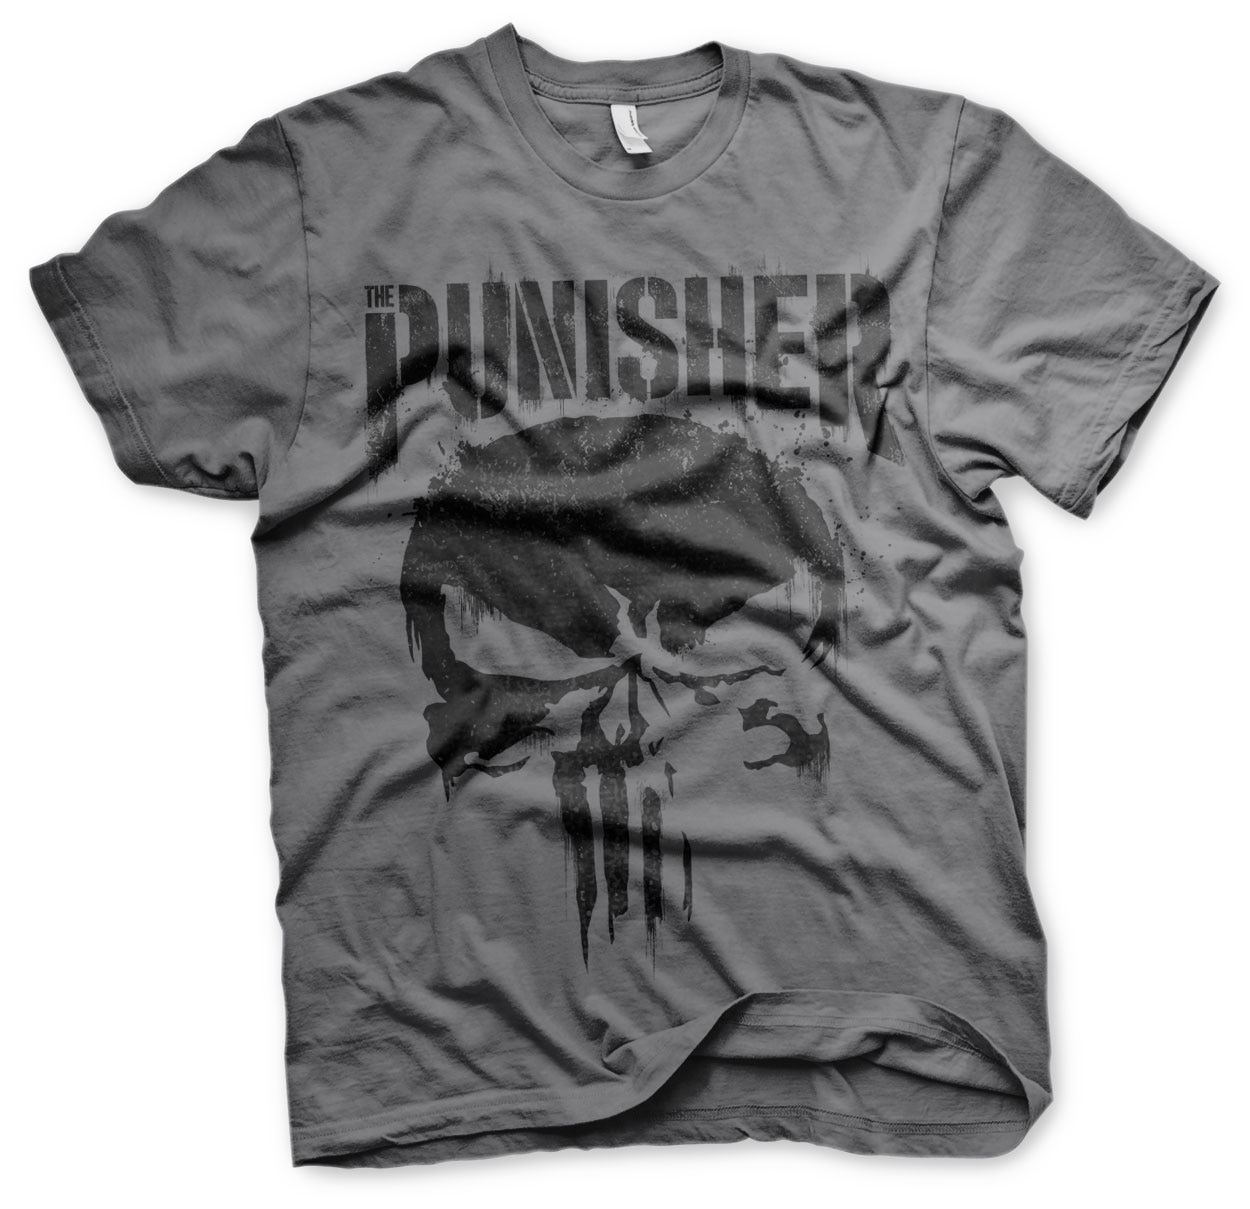 Marvel's The Punisher Big Skull T-Shirt